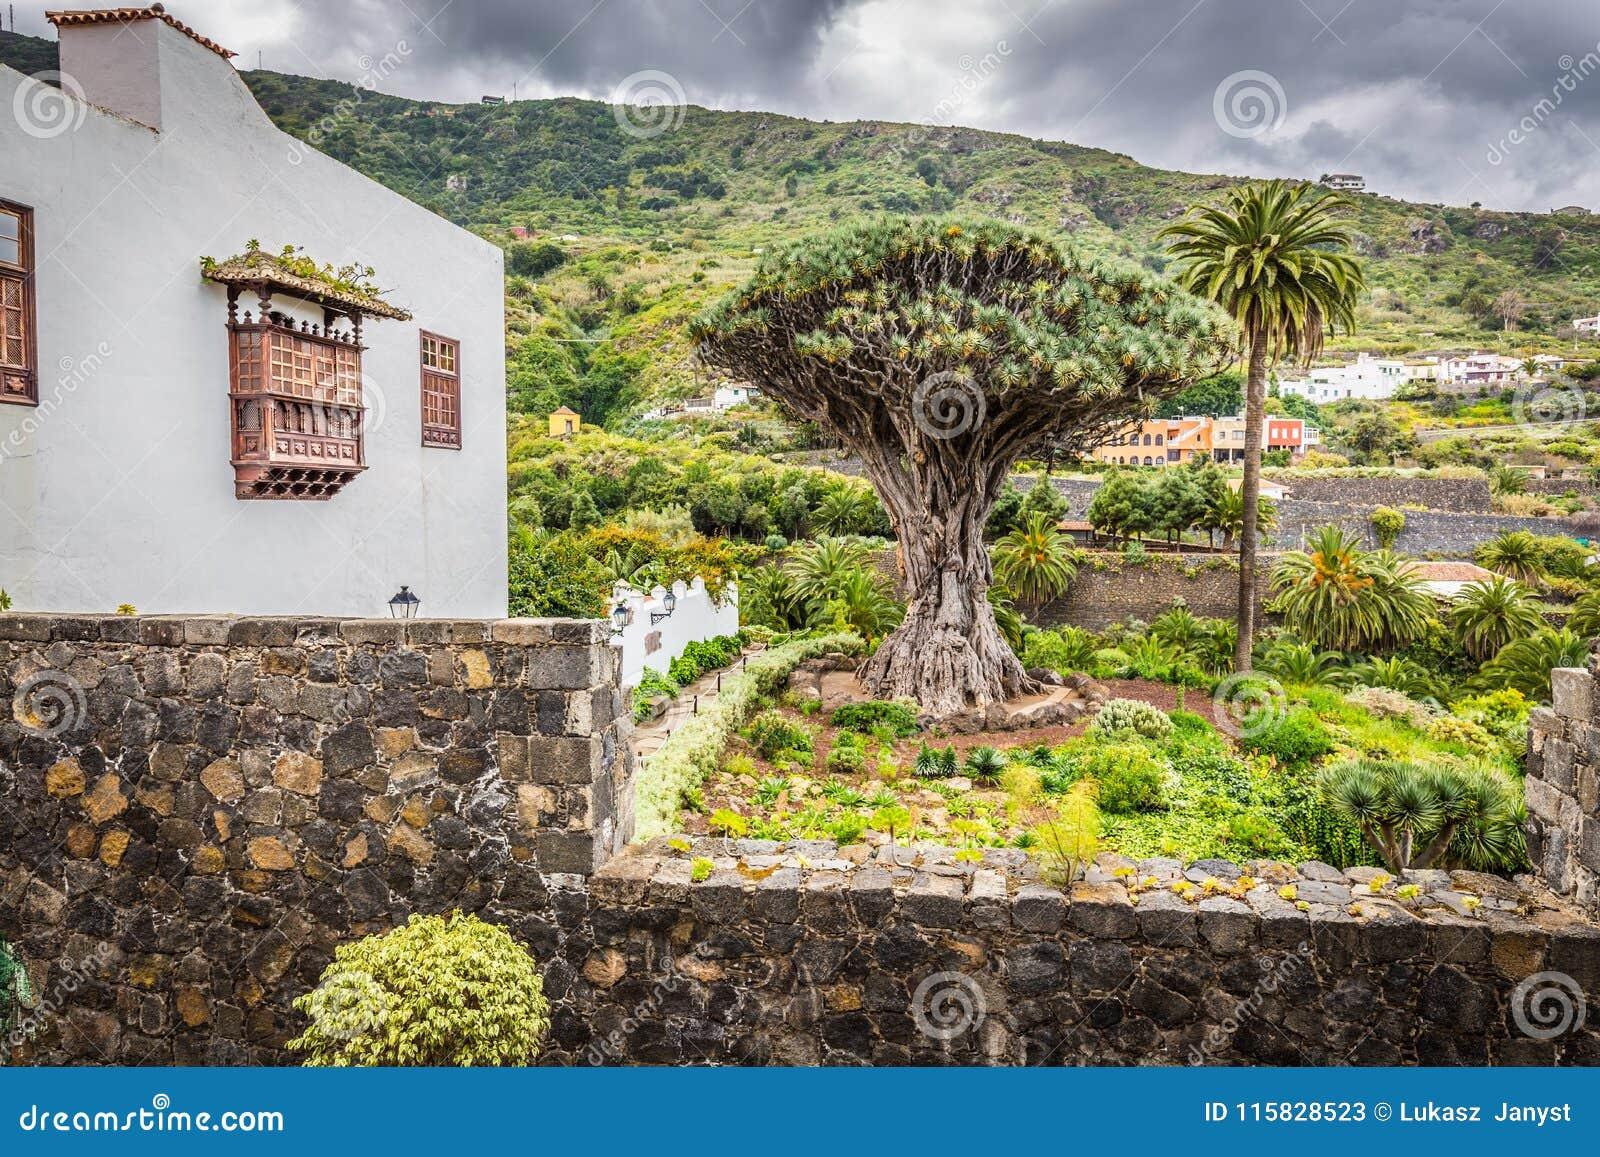 Dragon Tree Drago Milenario famoso em Icod de los Vinos Tenerife